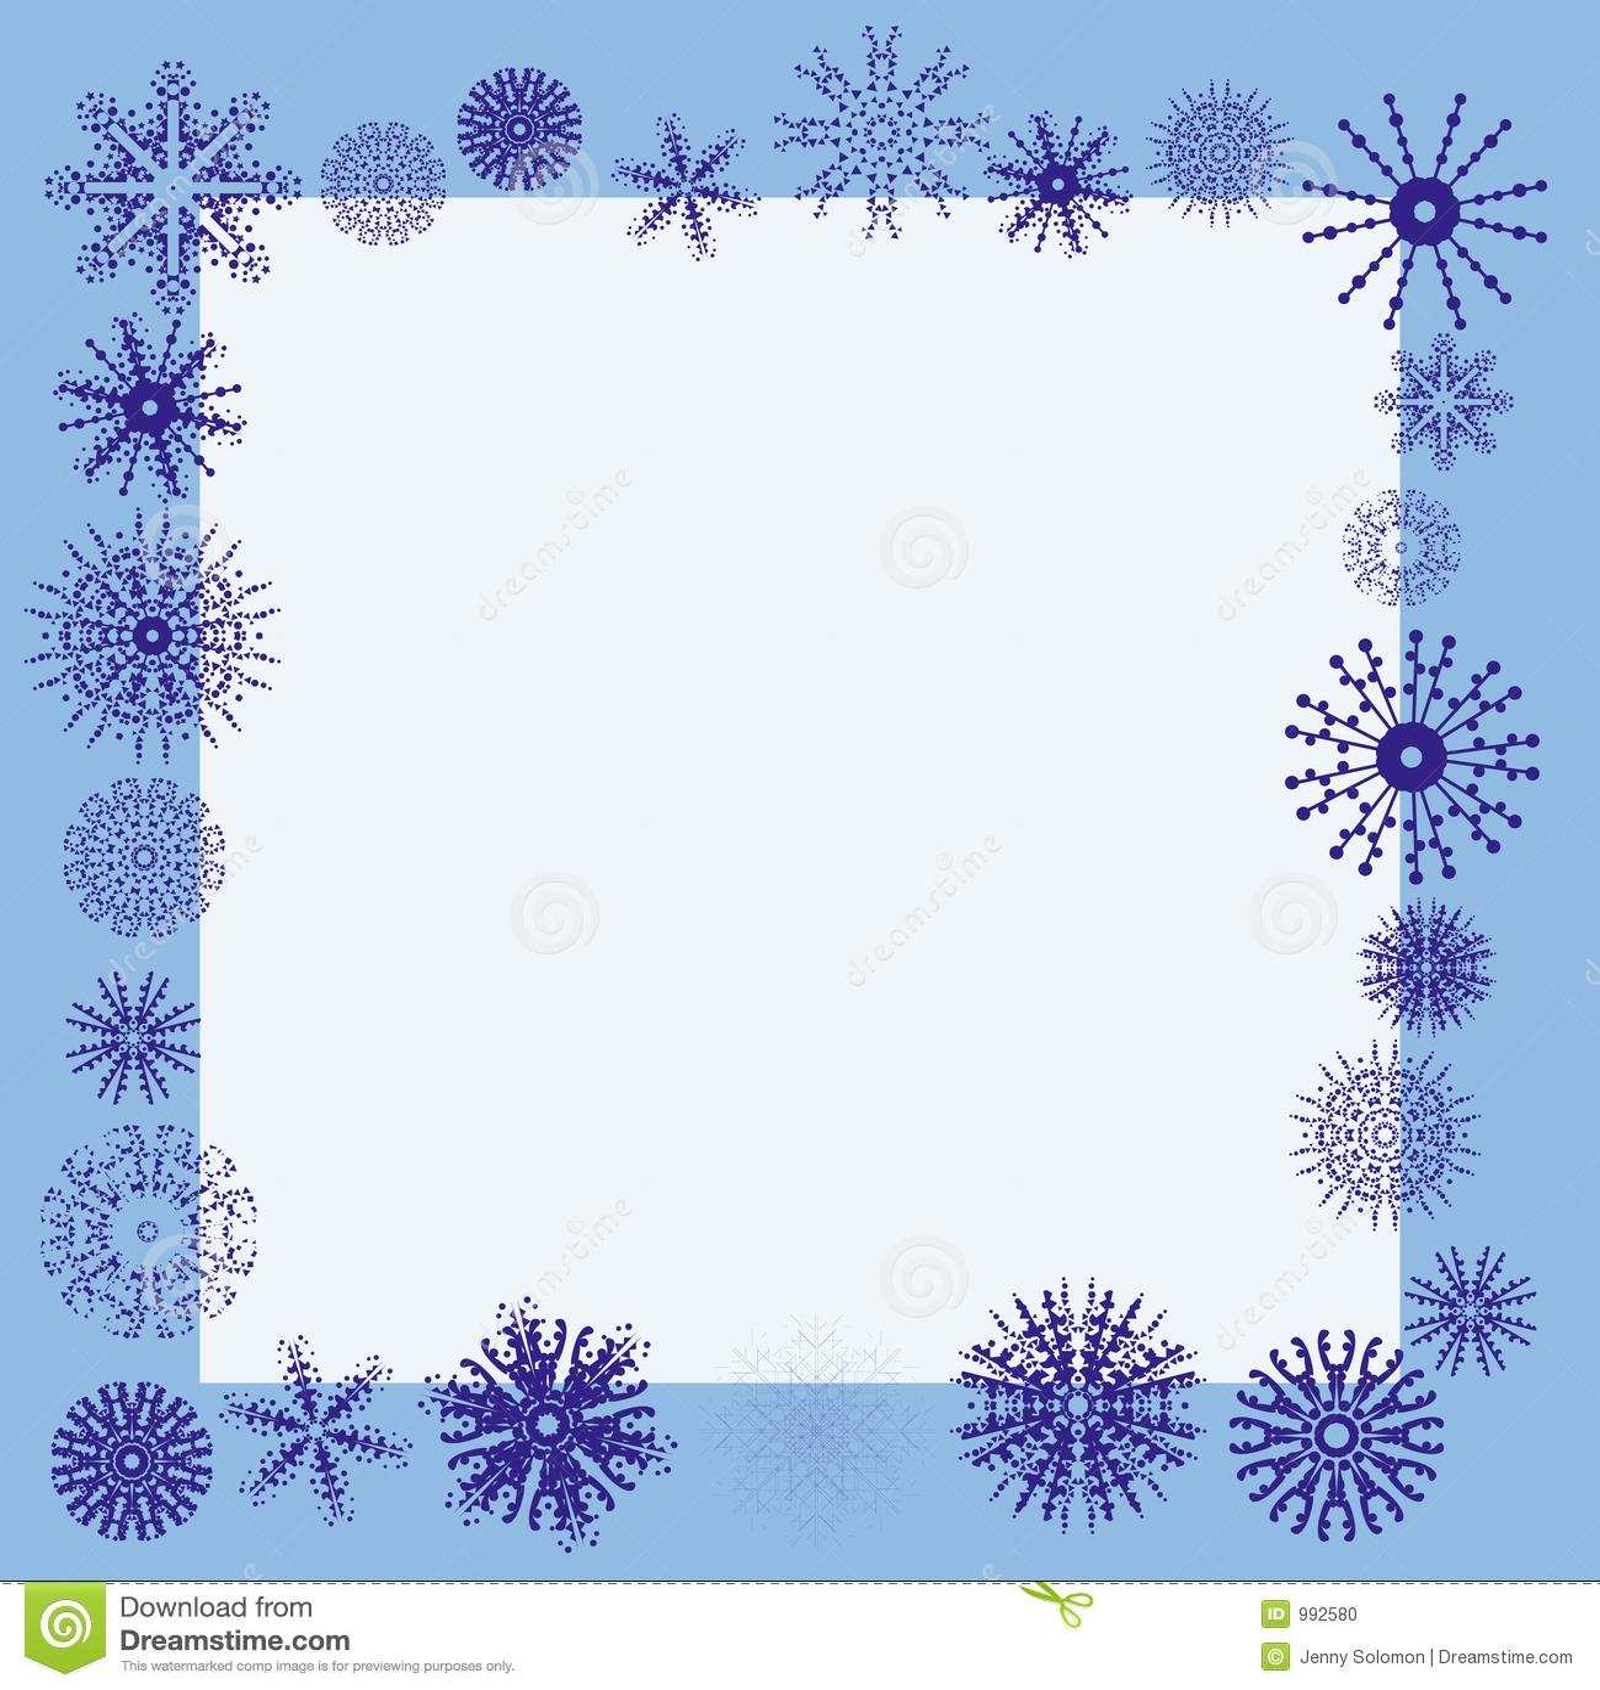 Winter snowflake border stock vector. Illustration of ...